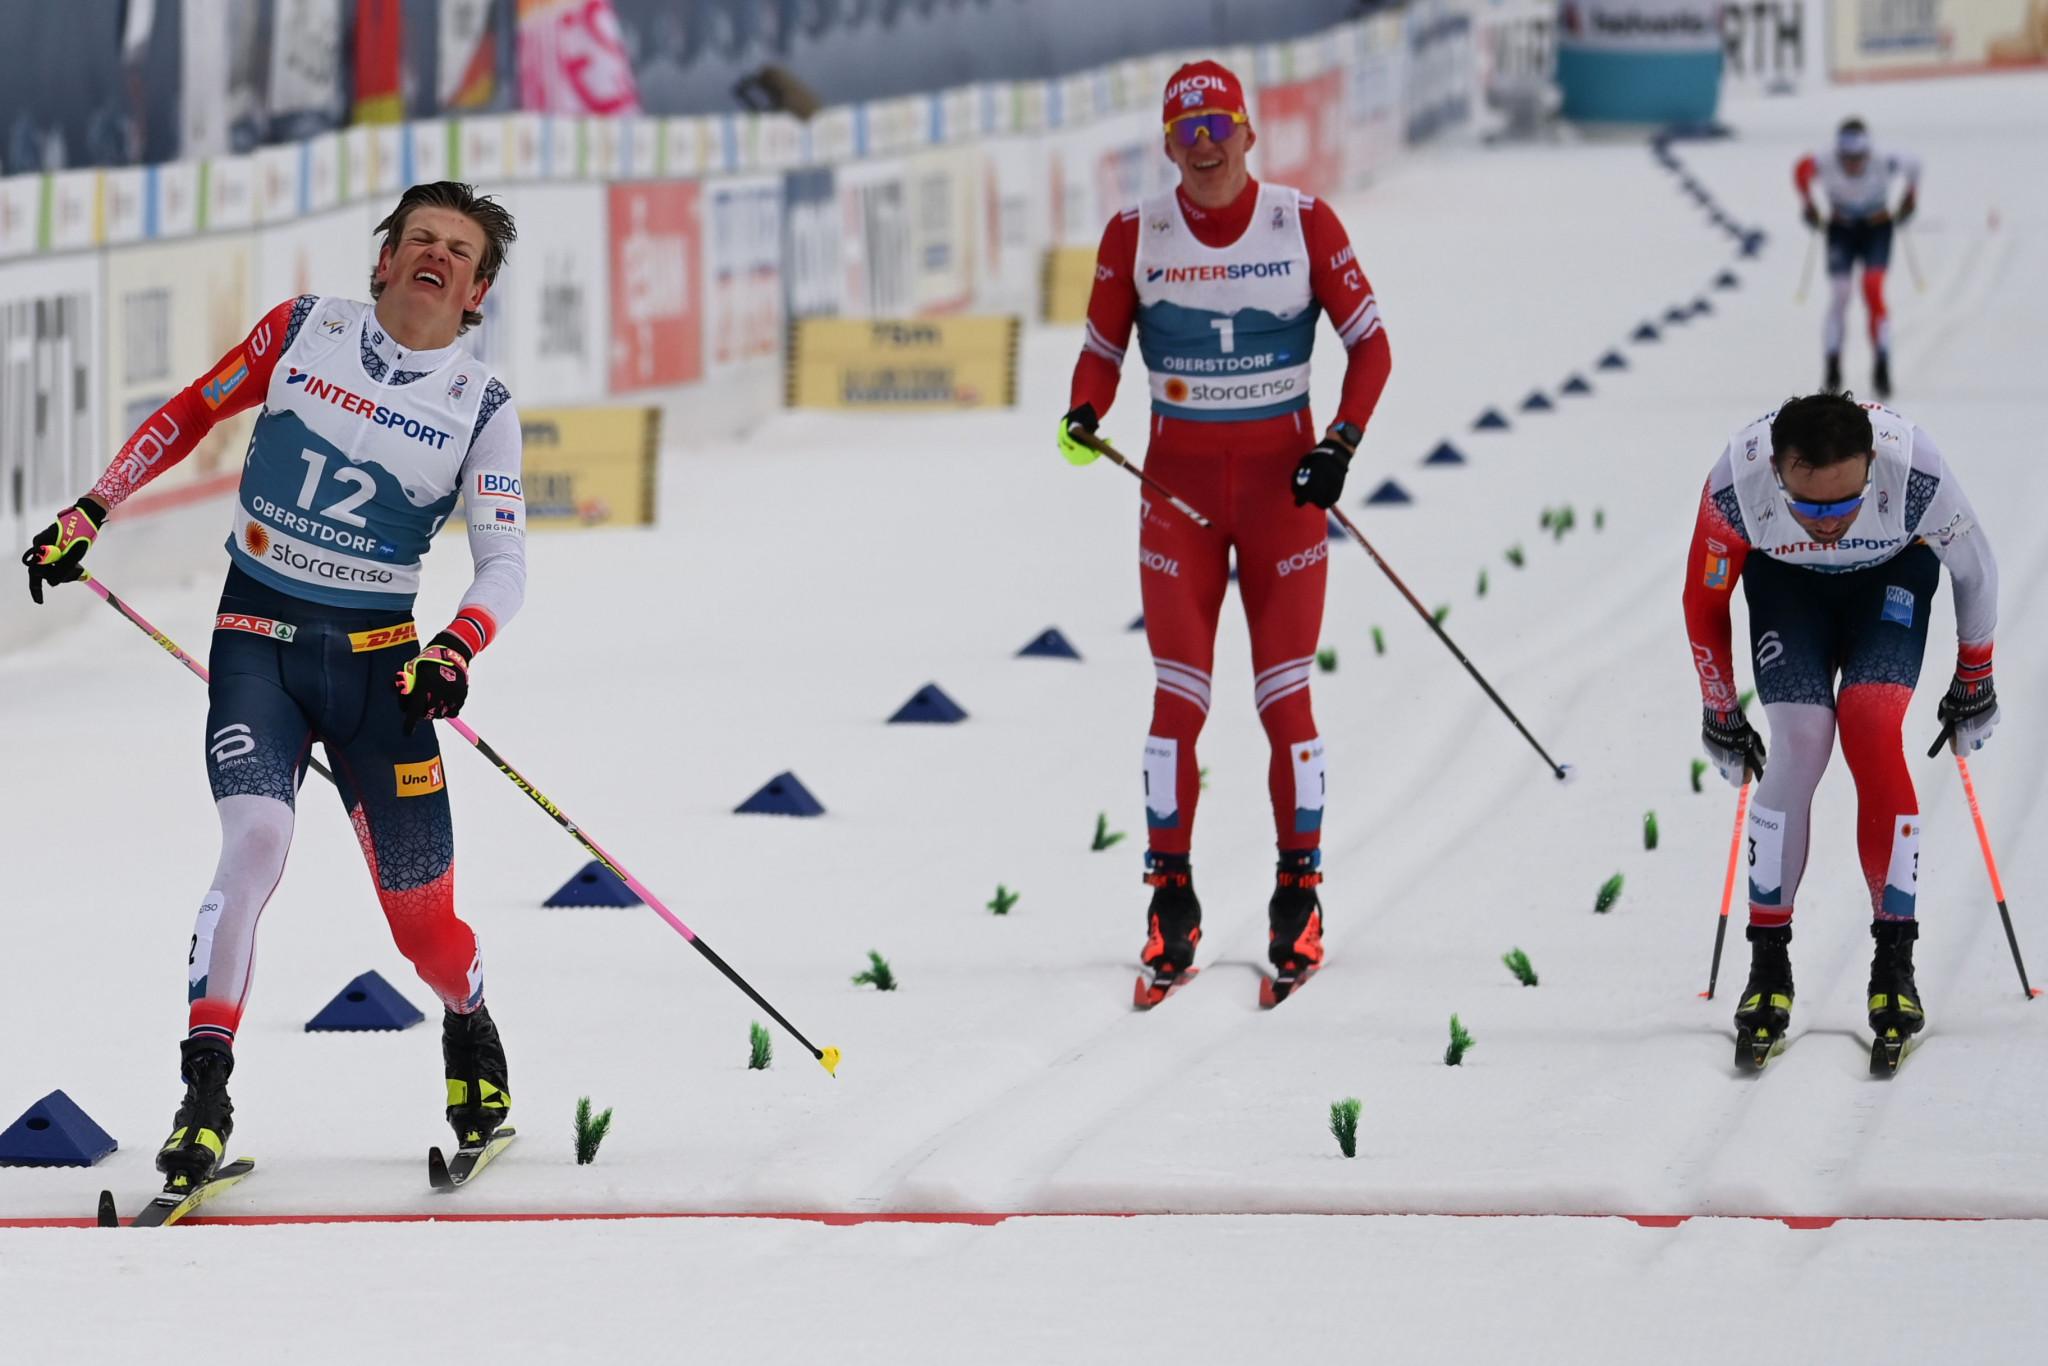 Iversen wins mass start event after Klæbo disqualified on final day of Nordic World Ski Championships